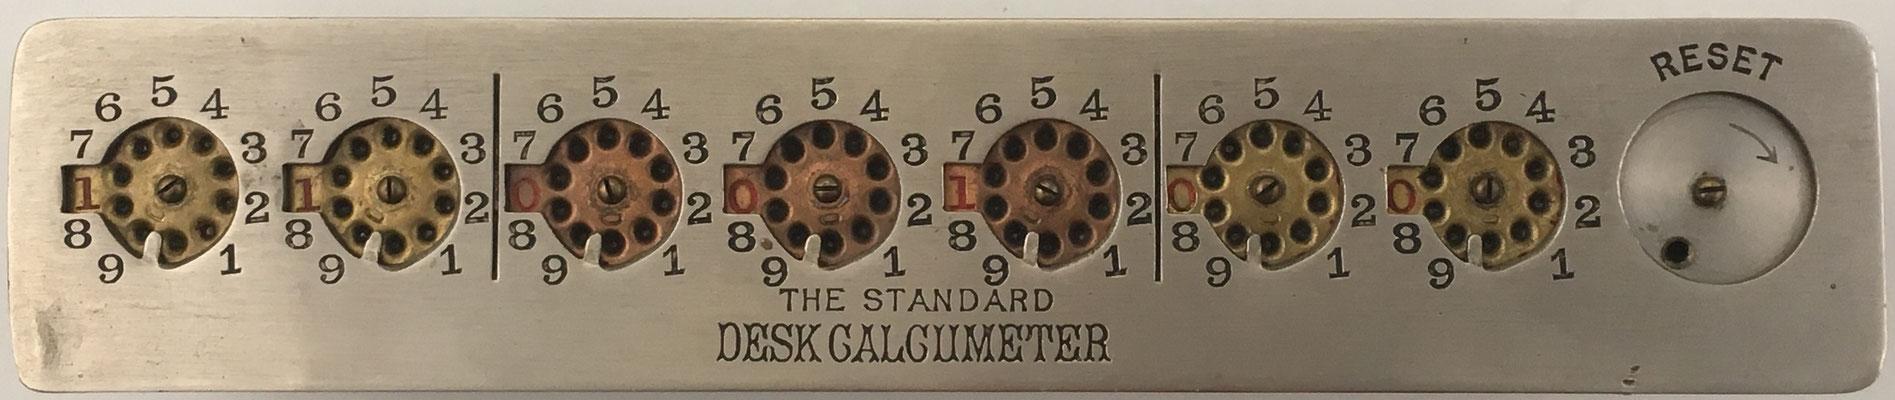 The Standard DESK CALCUMETER, s/n 90/68145, año 1901, H.N.Morse, Trenton N.J., 25x5X2 cm